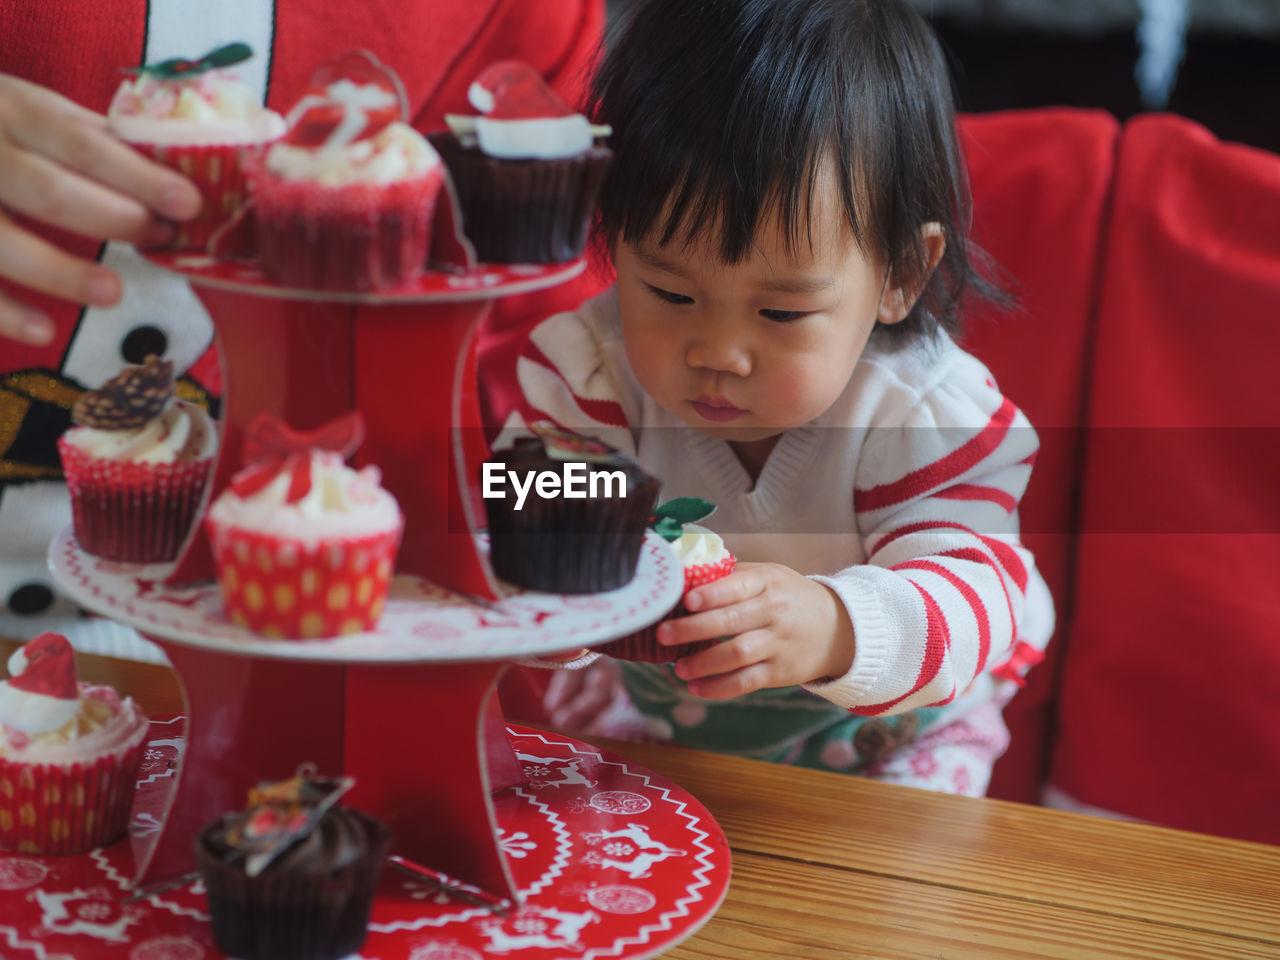 Baby Girl Having Cupcake At Table